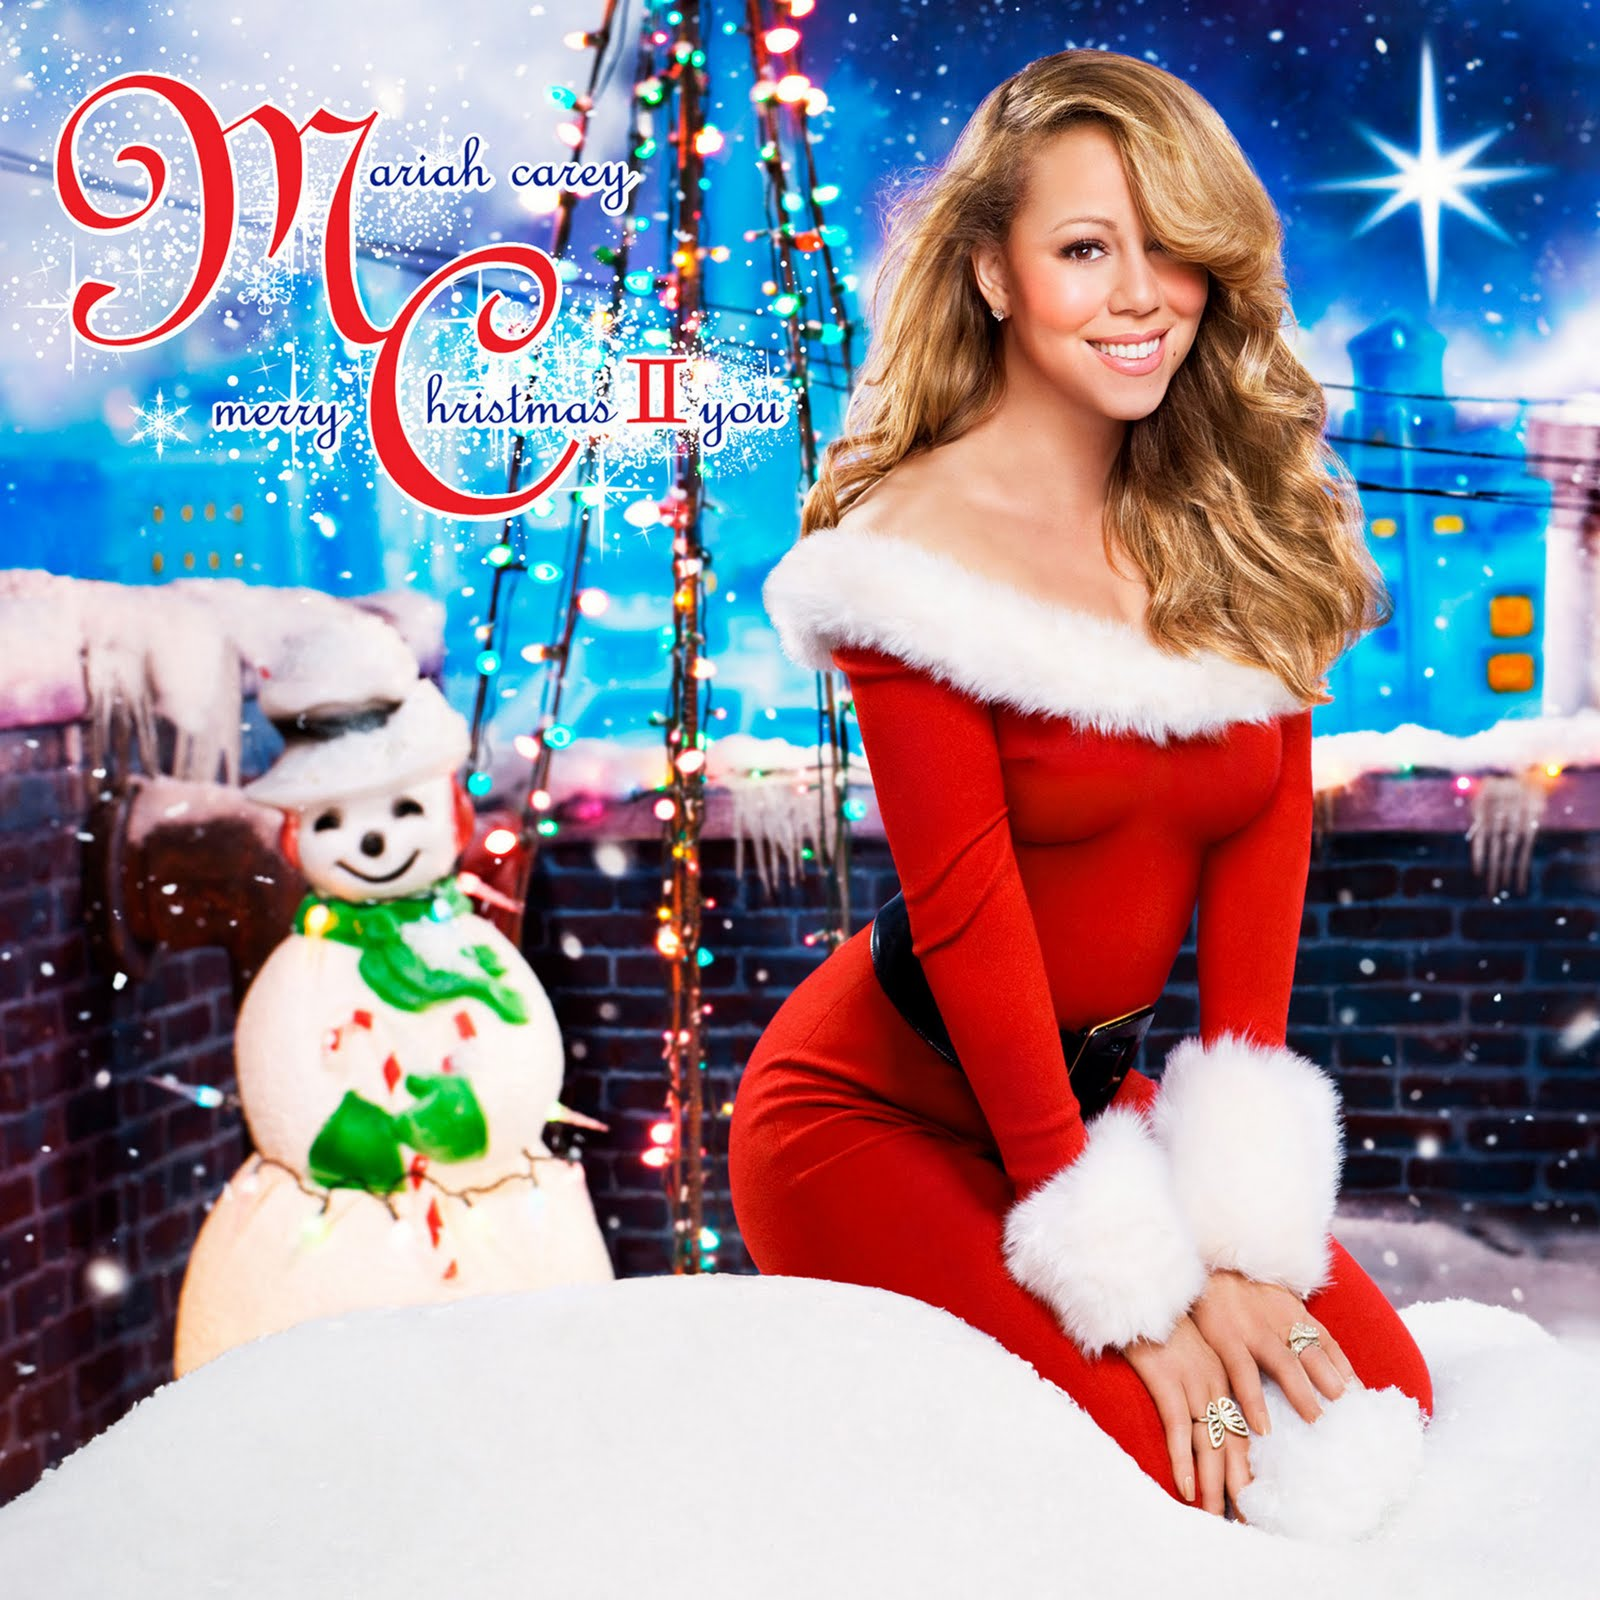 http://4.bp.blogspot.com/_bq9TcMaVMGw/TRTR0PFKxsI/AAAAAAAAE7E/mgixI6-4a6Q/s1600/Mariah+Carey+-+Oh+Santa%2521.jpg